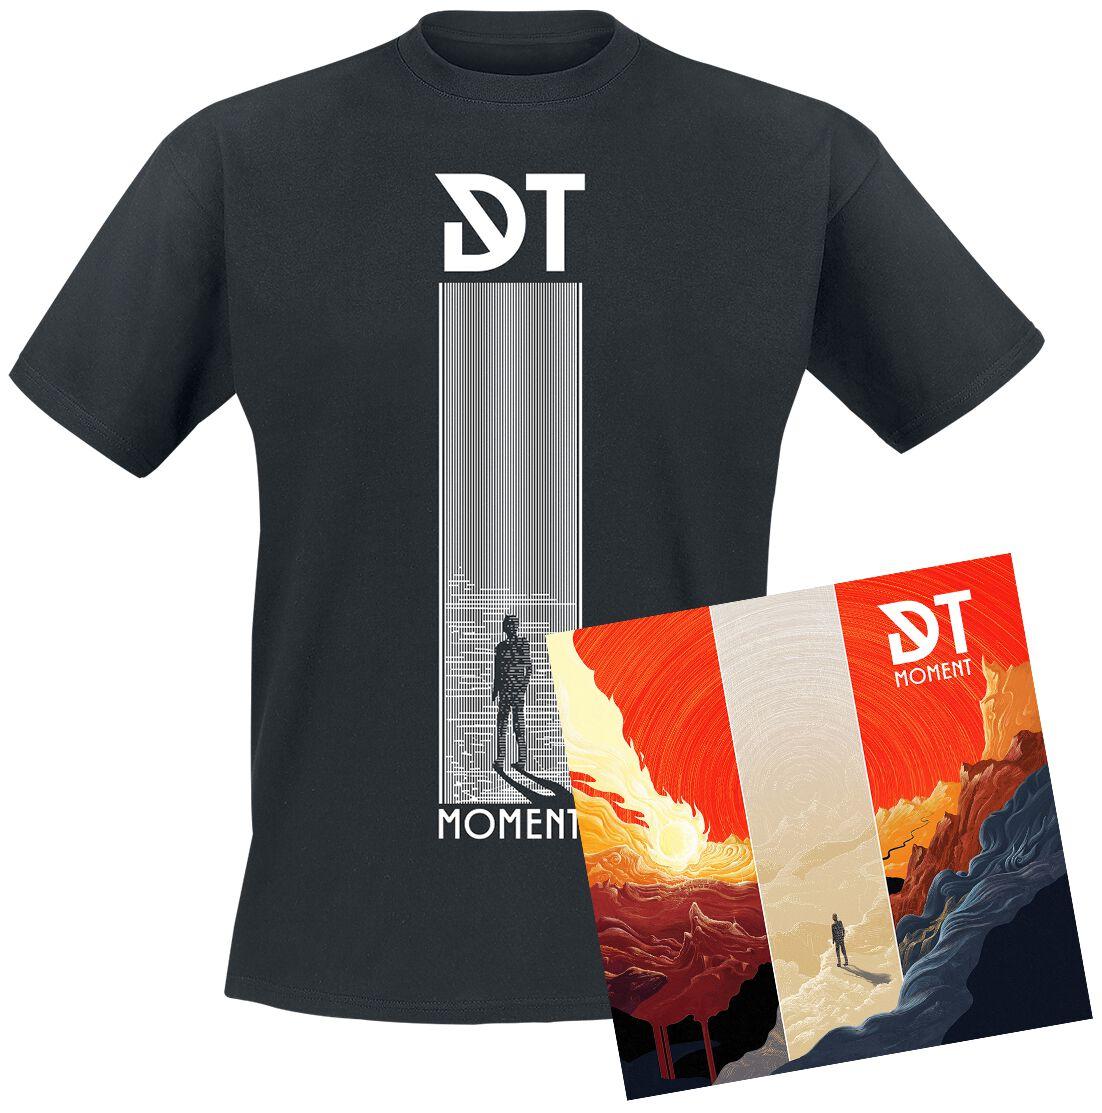 Image of Dark Tranquillity Moment CD & T-Shirt Standard